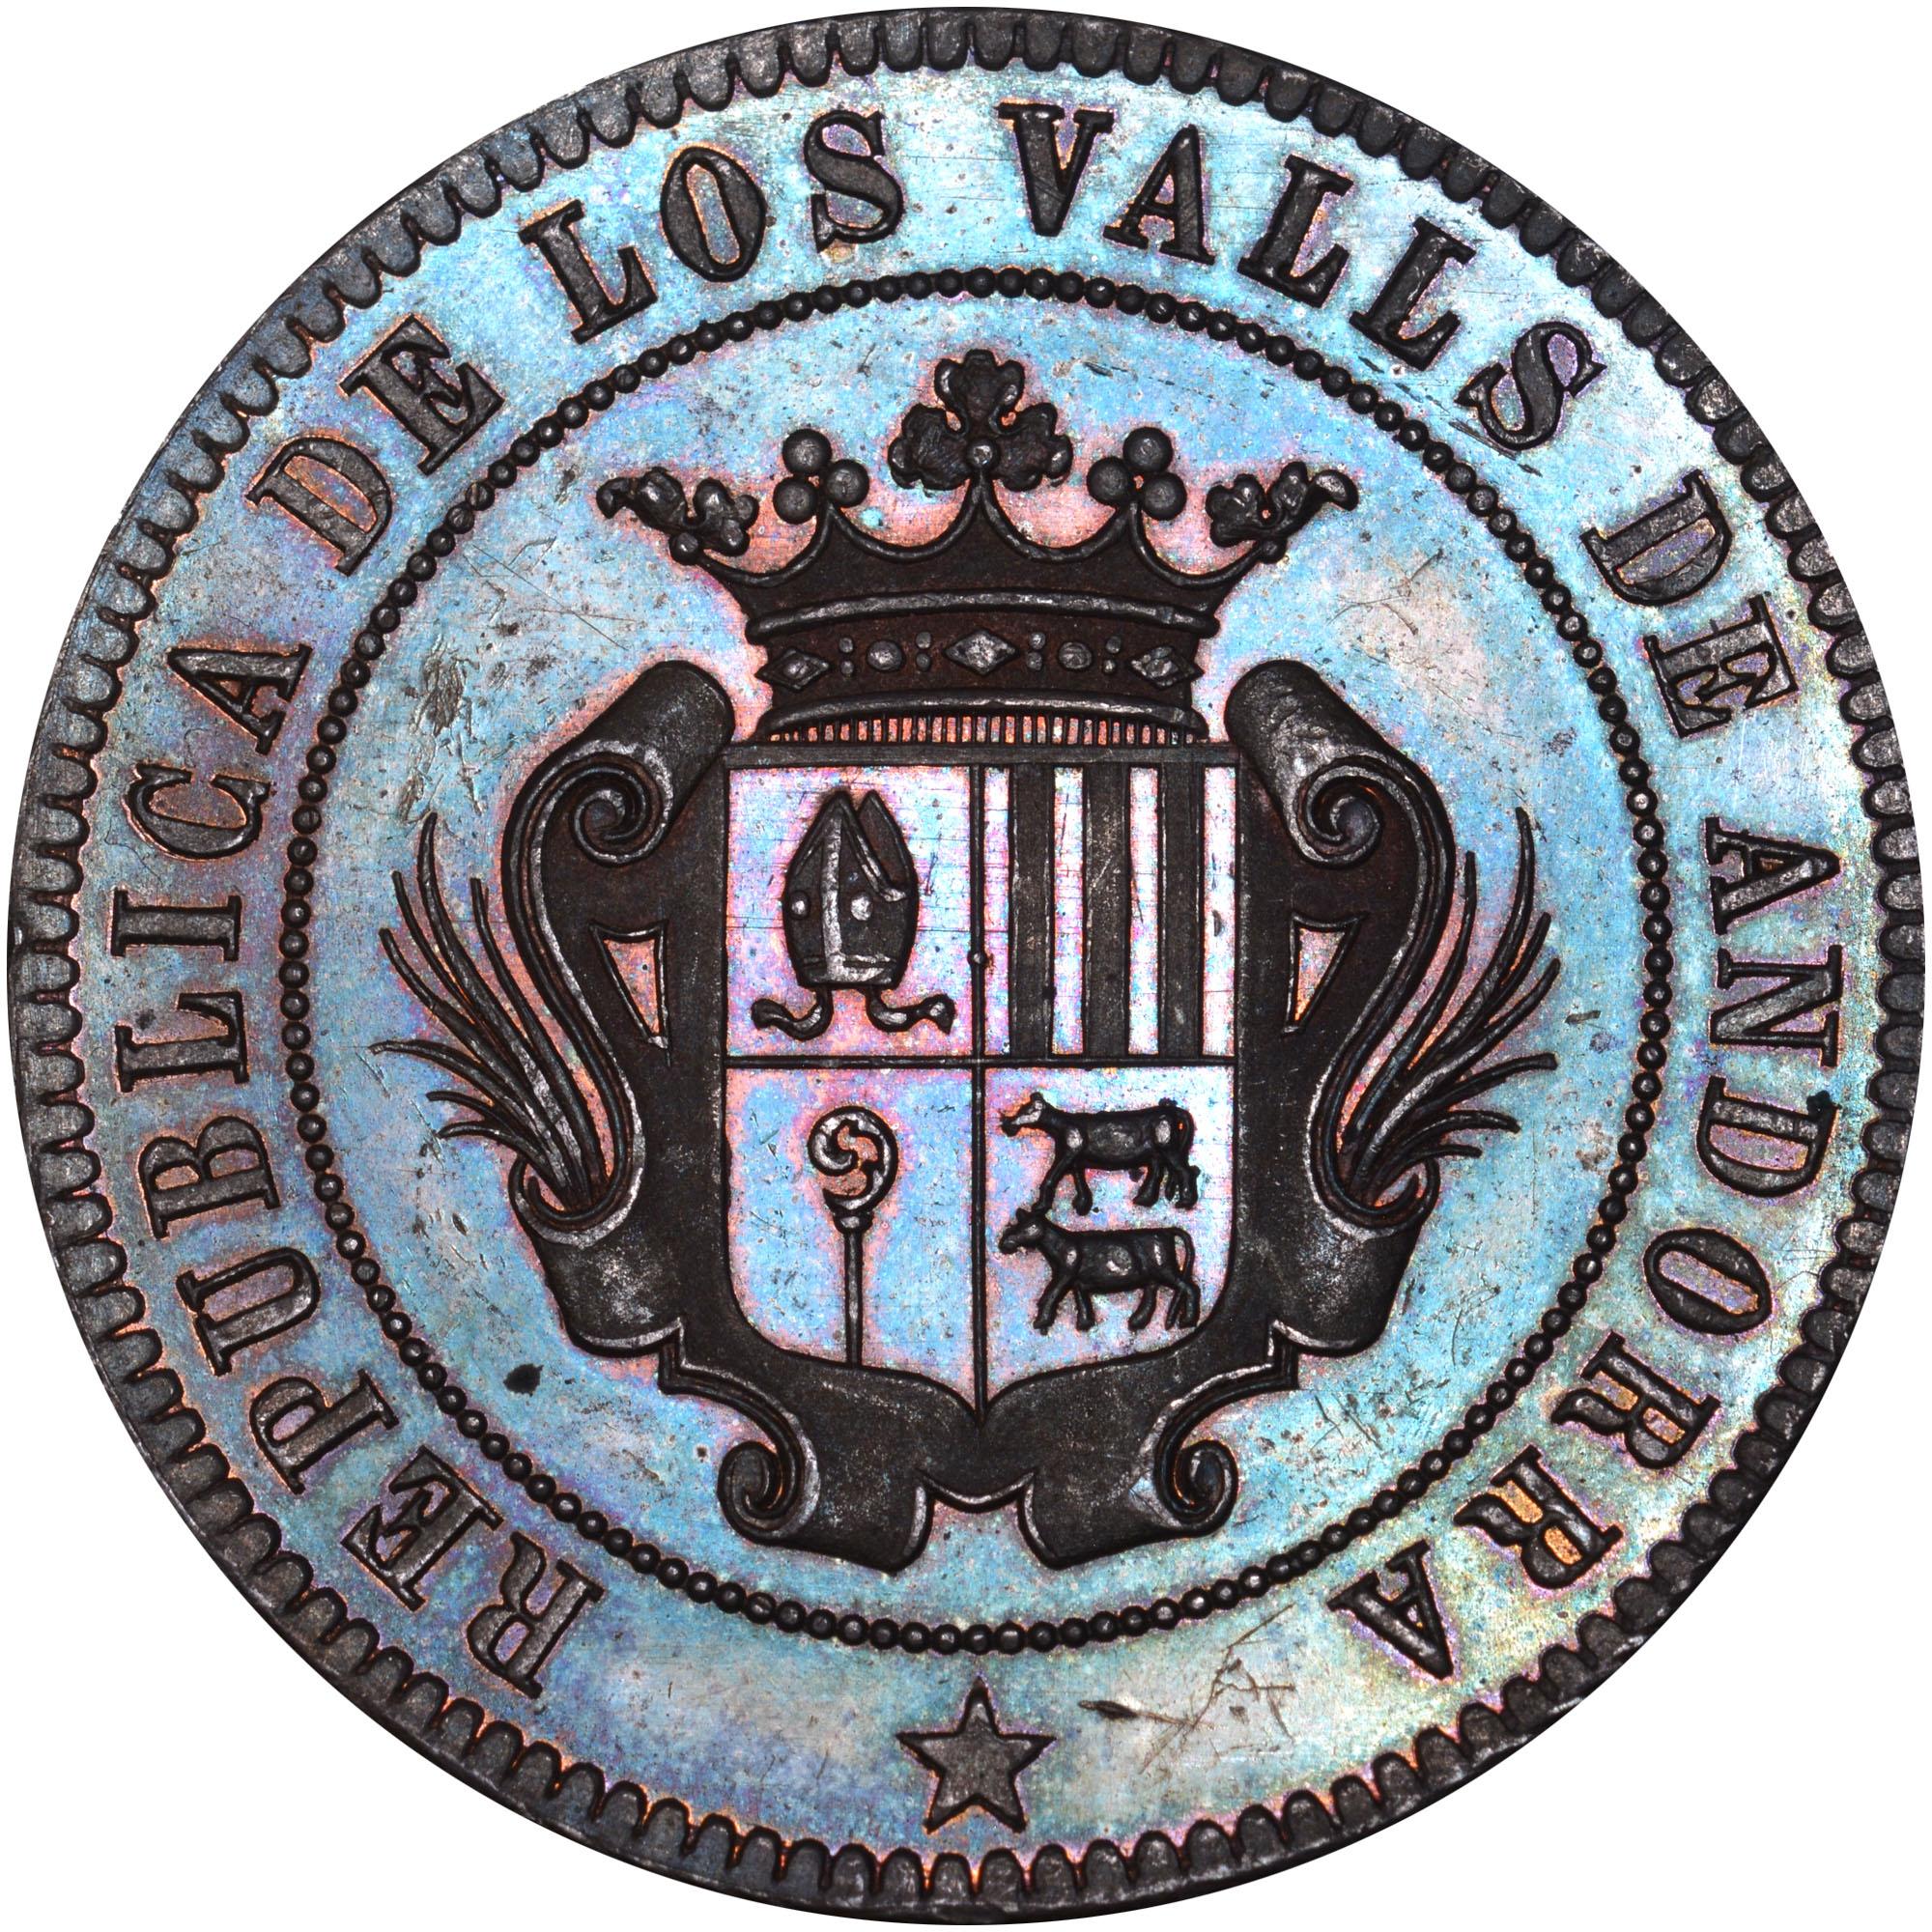 1873 Andorra 10 Centimos obverse